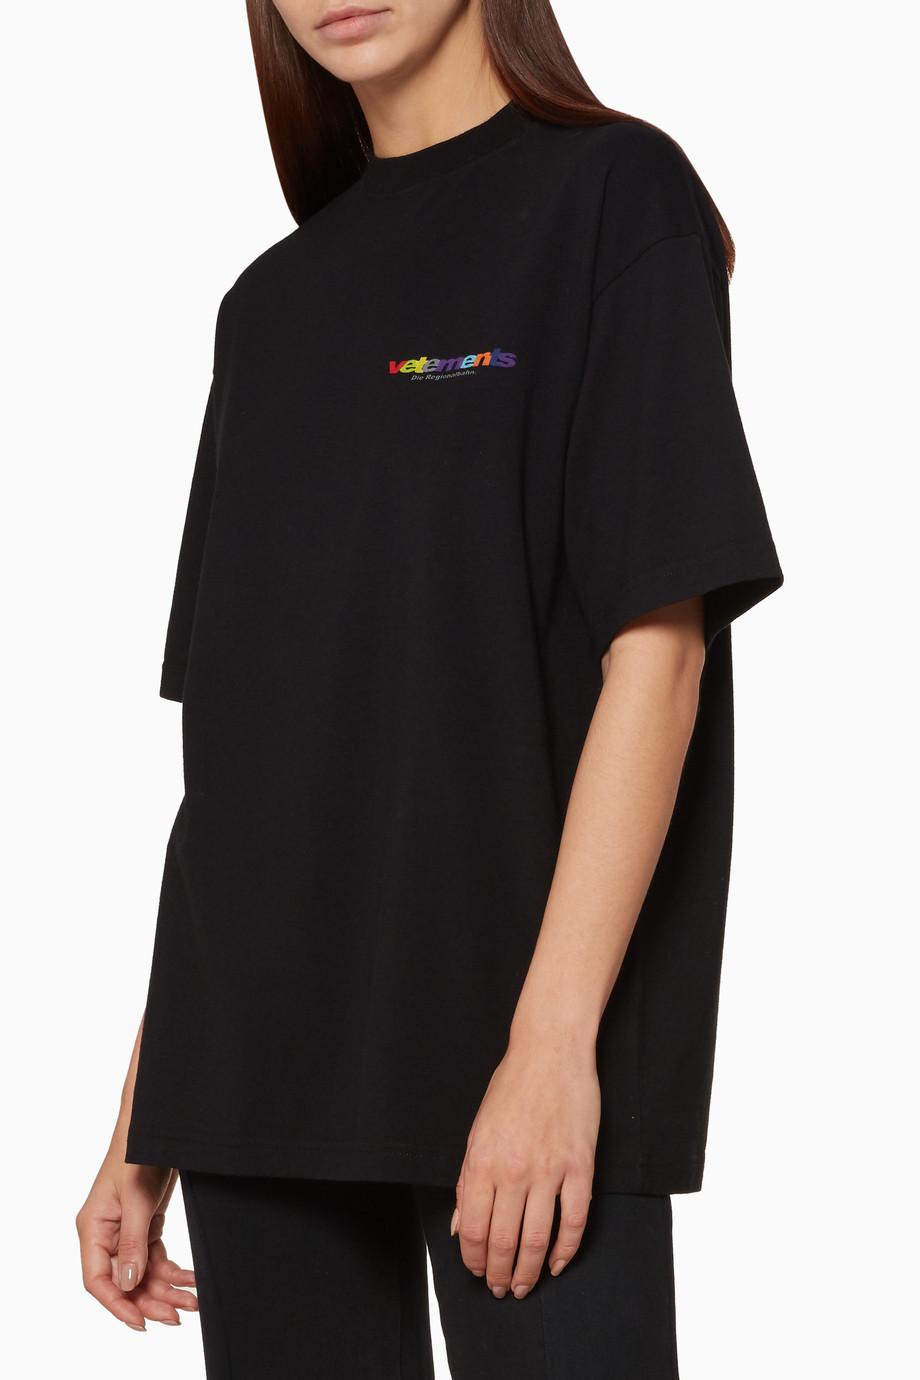 53f35d58 Shop Vetements Black Black Metal Oversized T-Shirt for Women ...